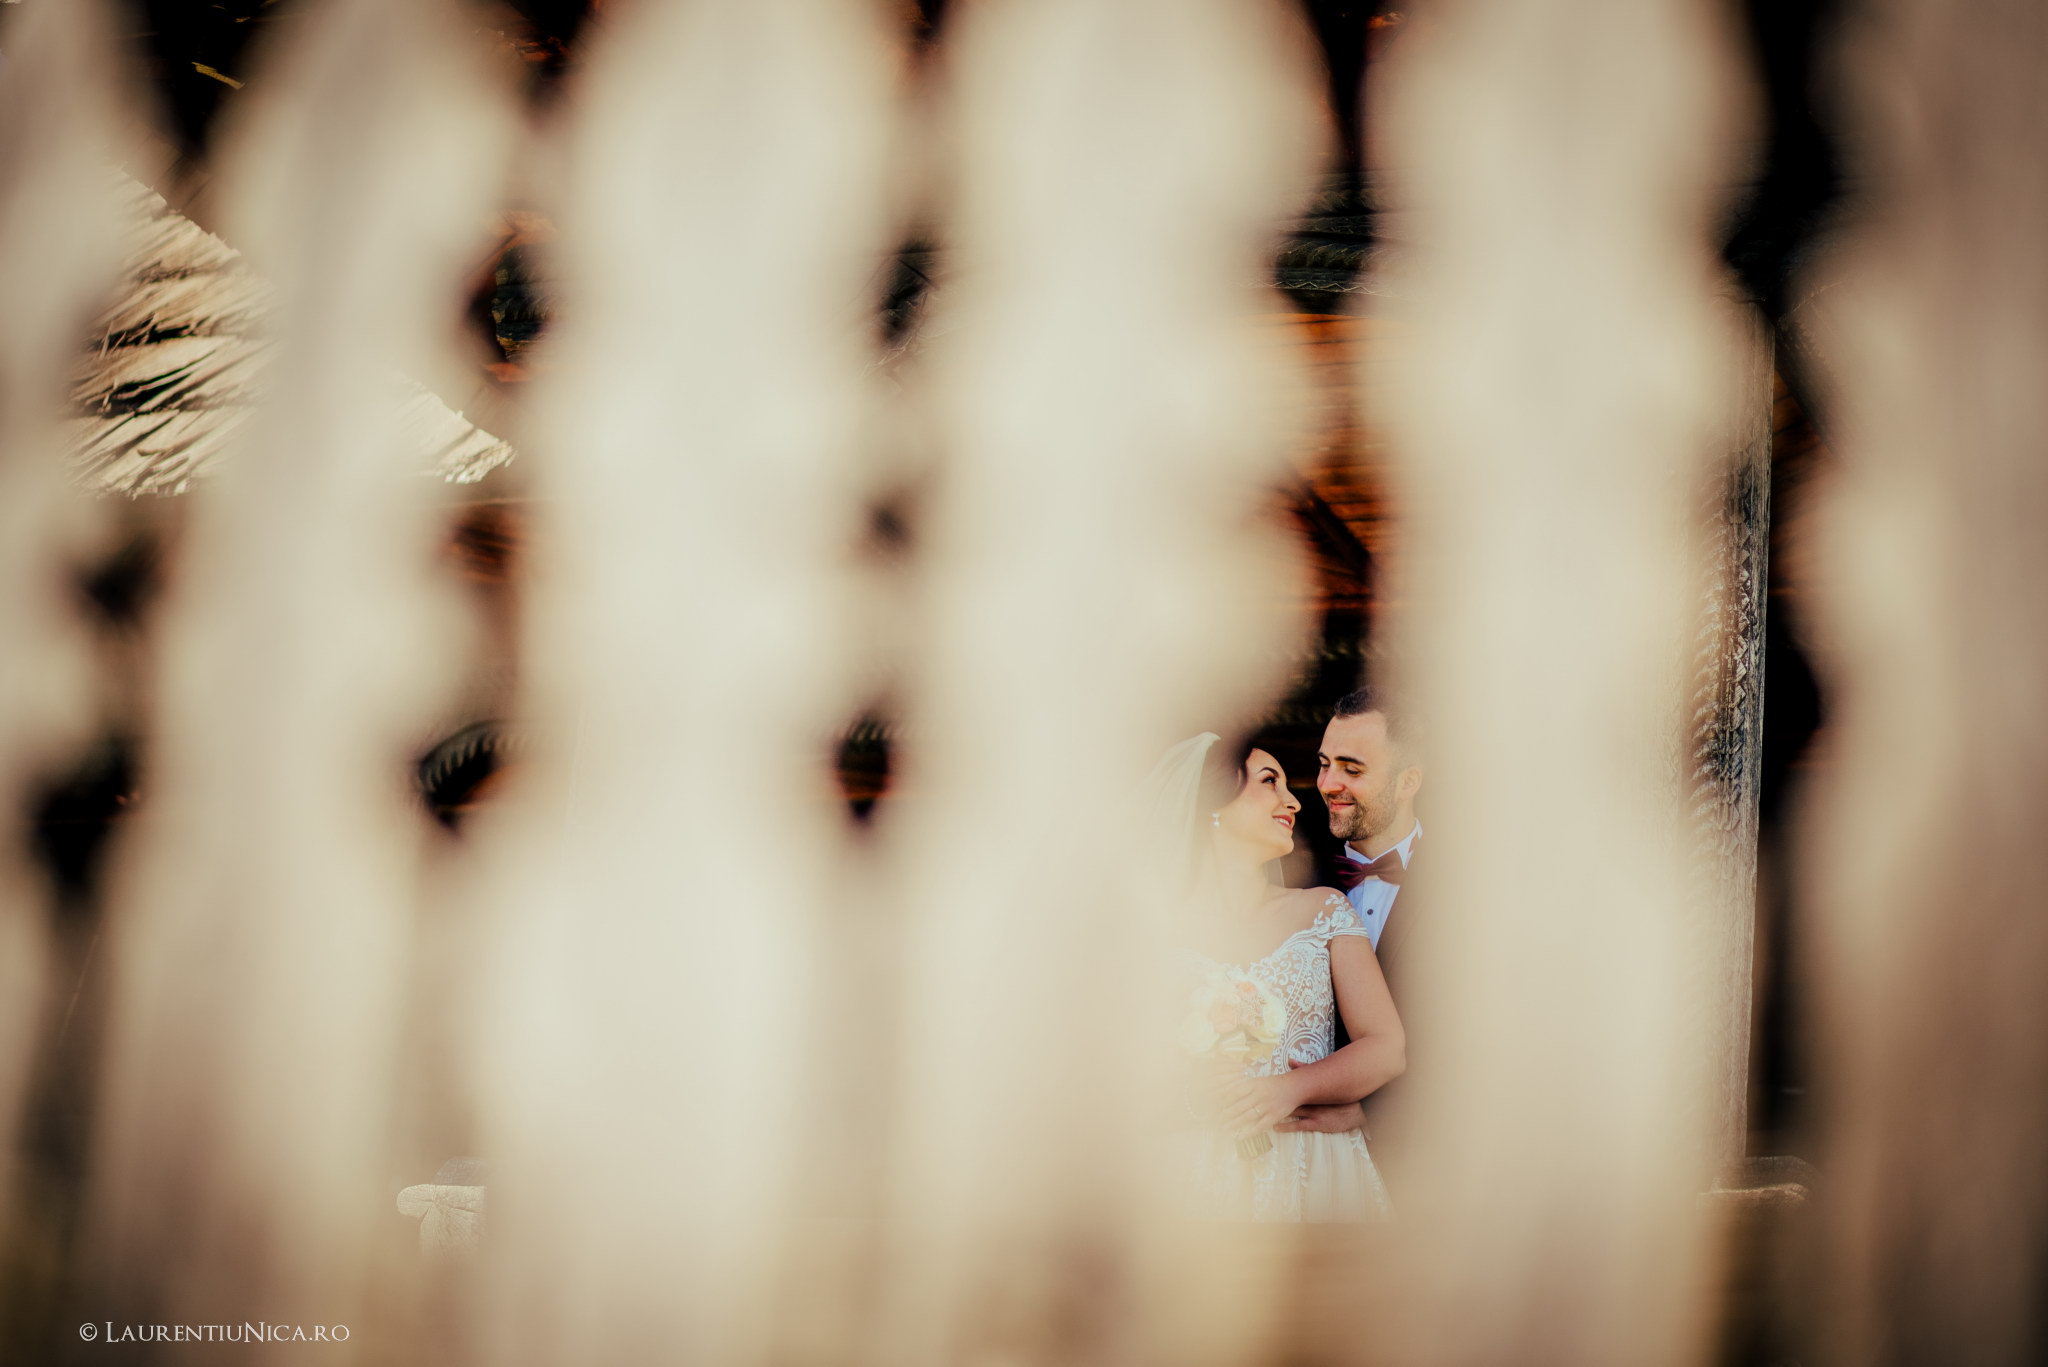 daiana si madalin fotograf nunta laurentiu nica targu jiu gorj 14 - Daiana & Madalin | Fotografii nunta | Targu-Jiu | Gorj